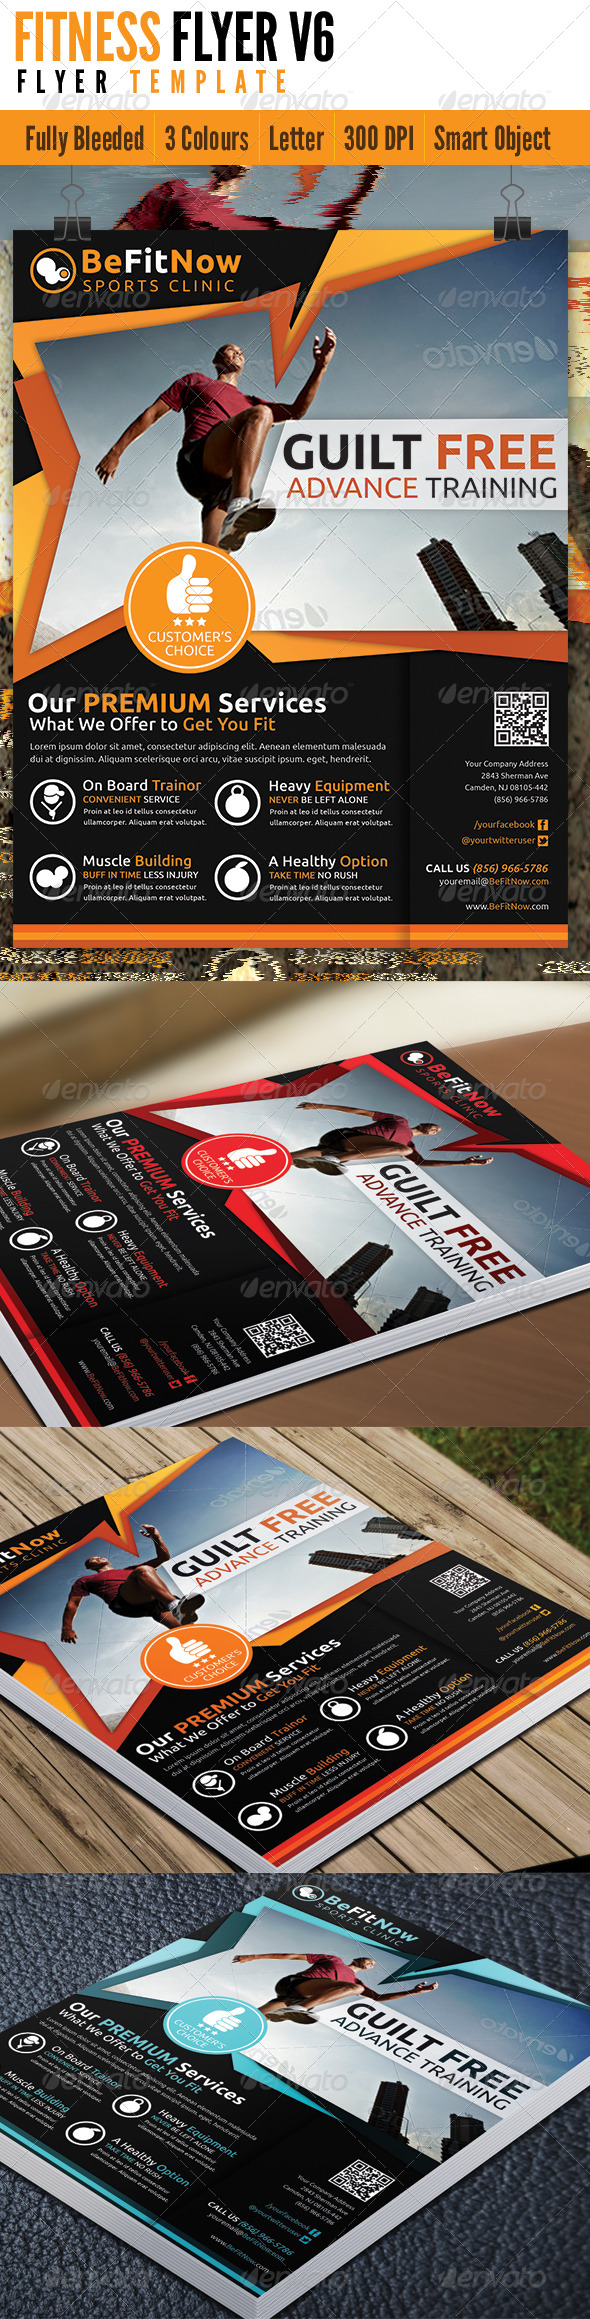 GraphicRiver Fitness Flyer V6 4629423